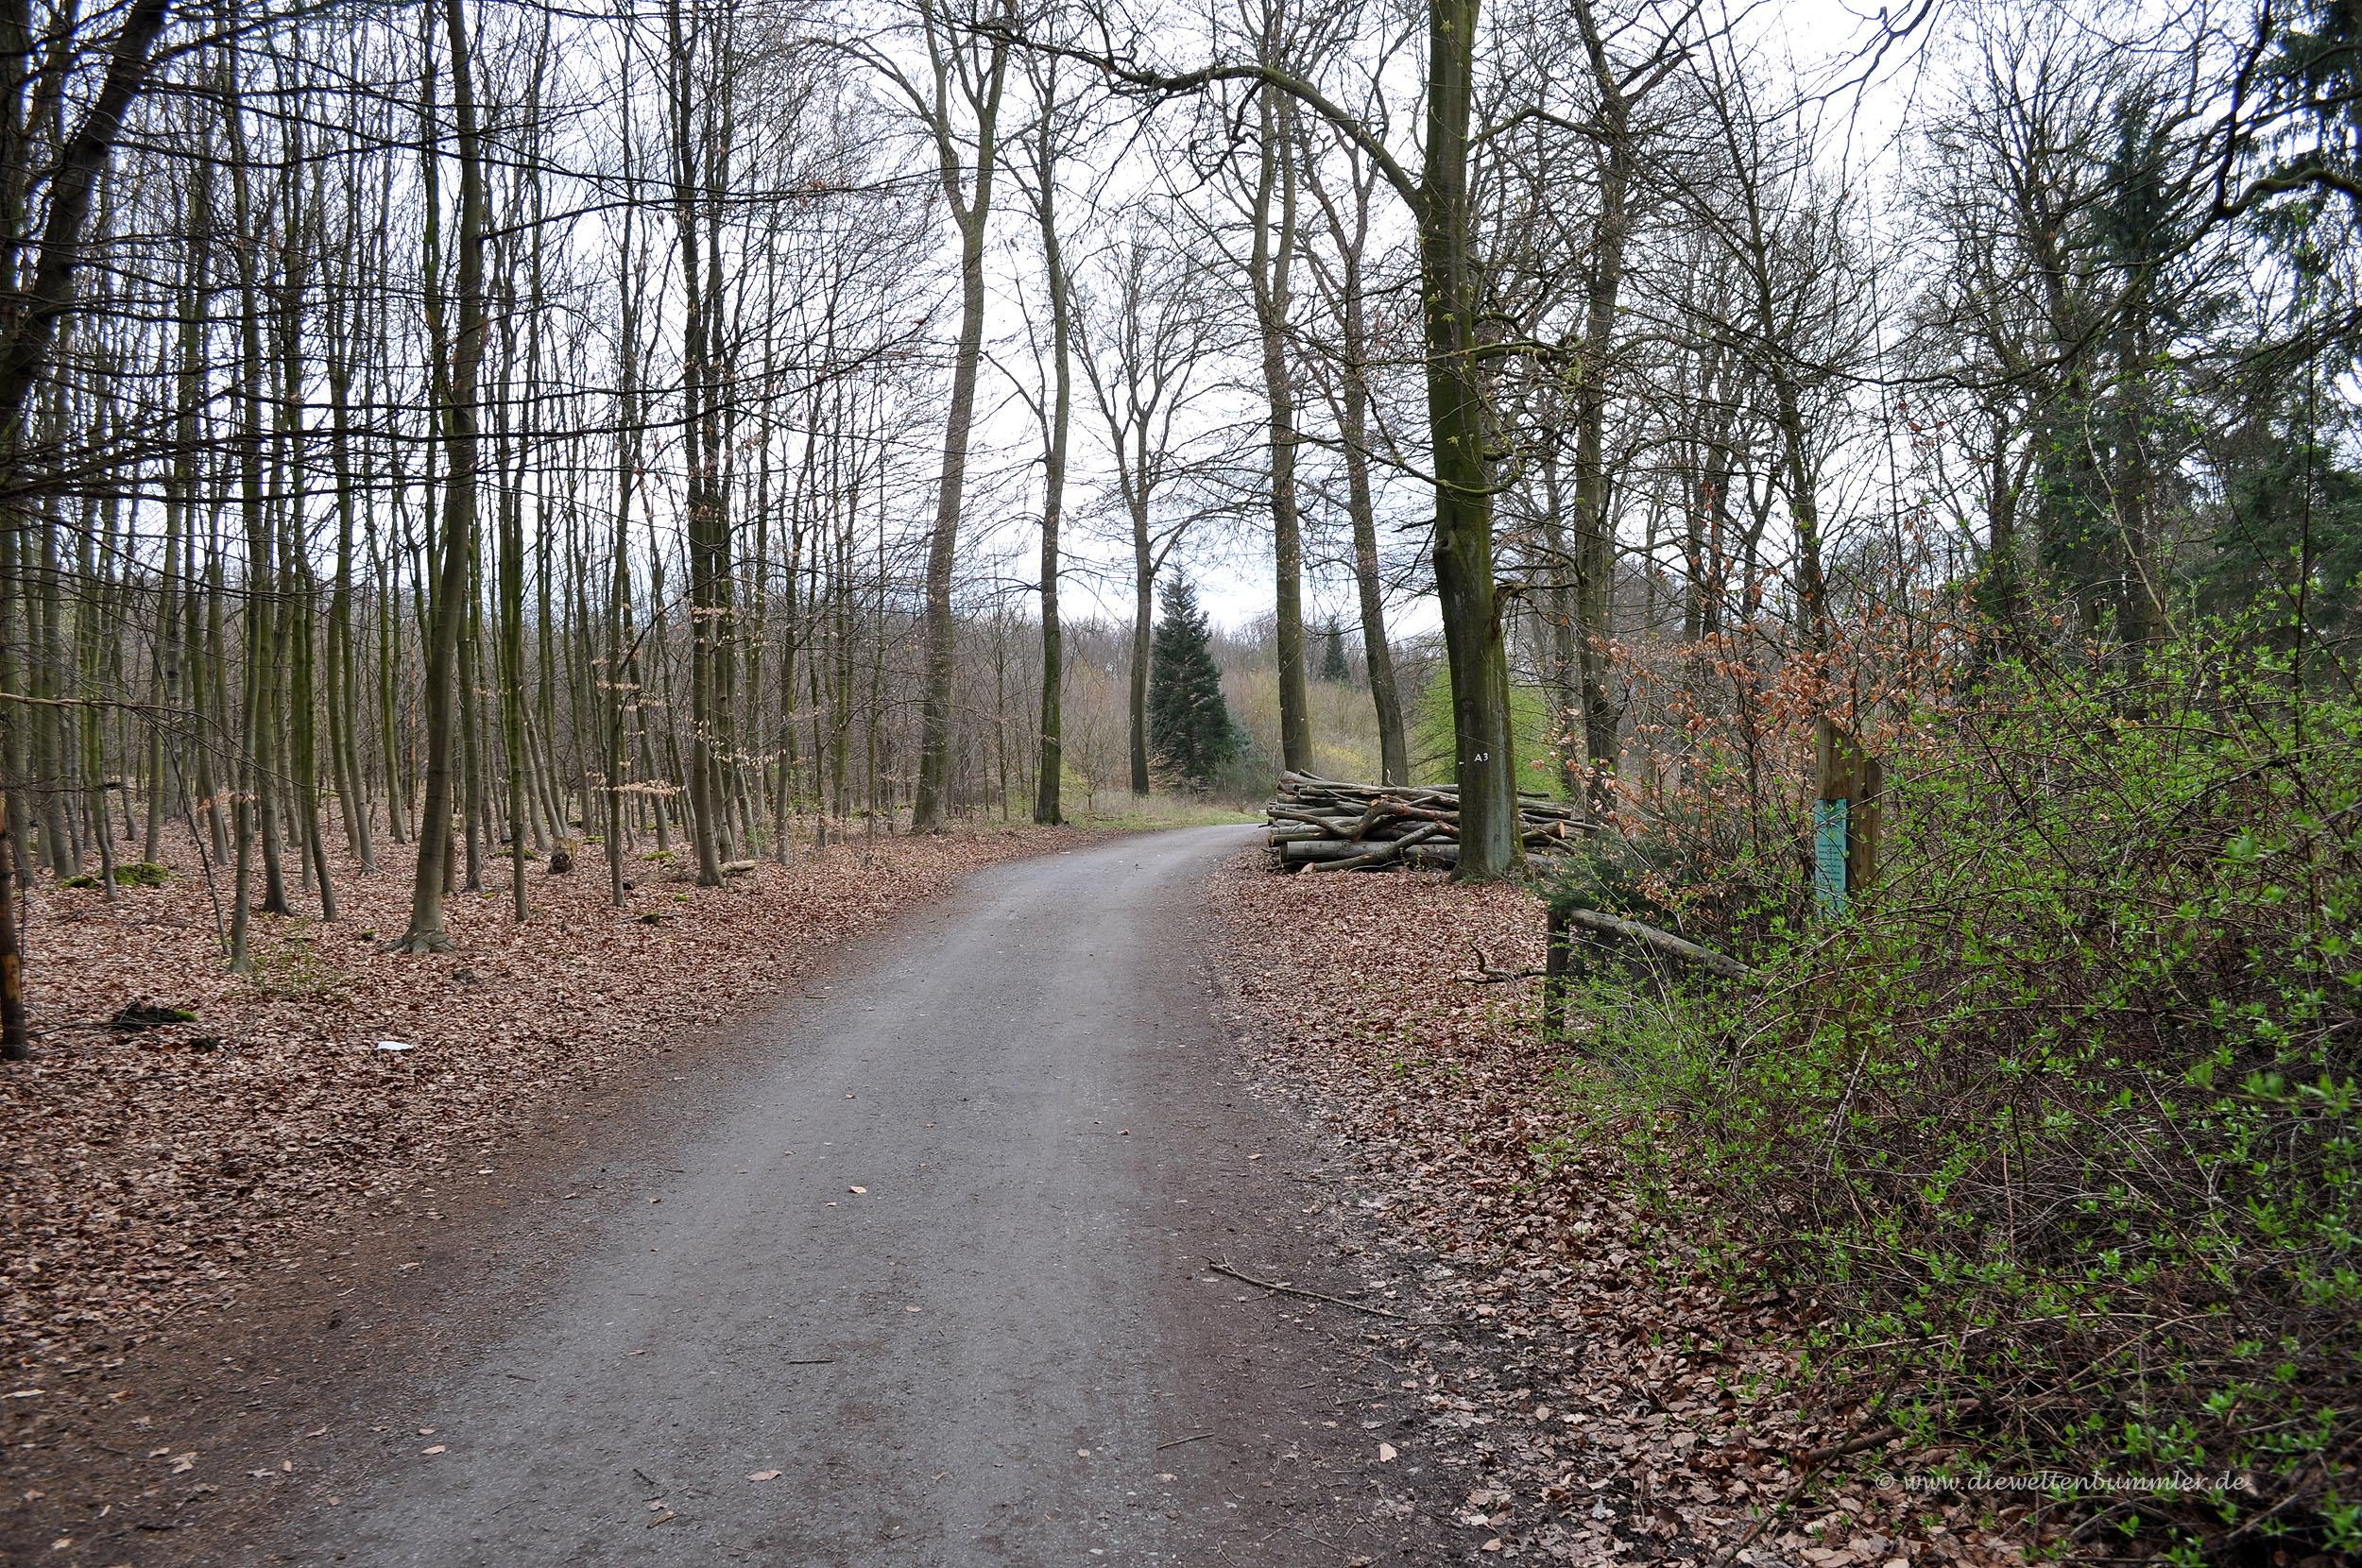 Wanderung im Stadtwald